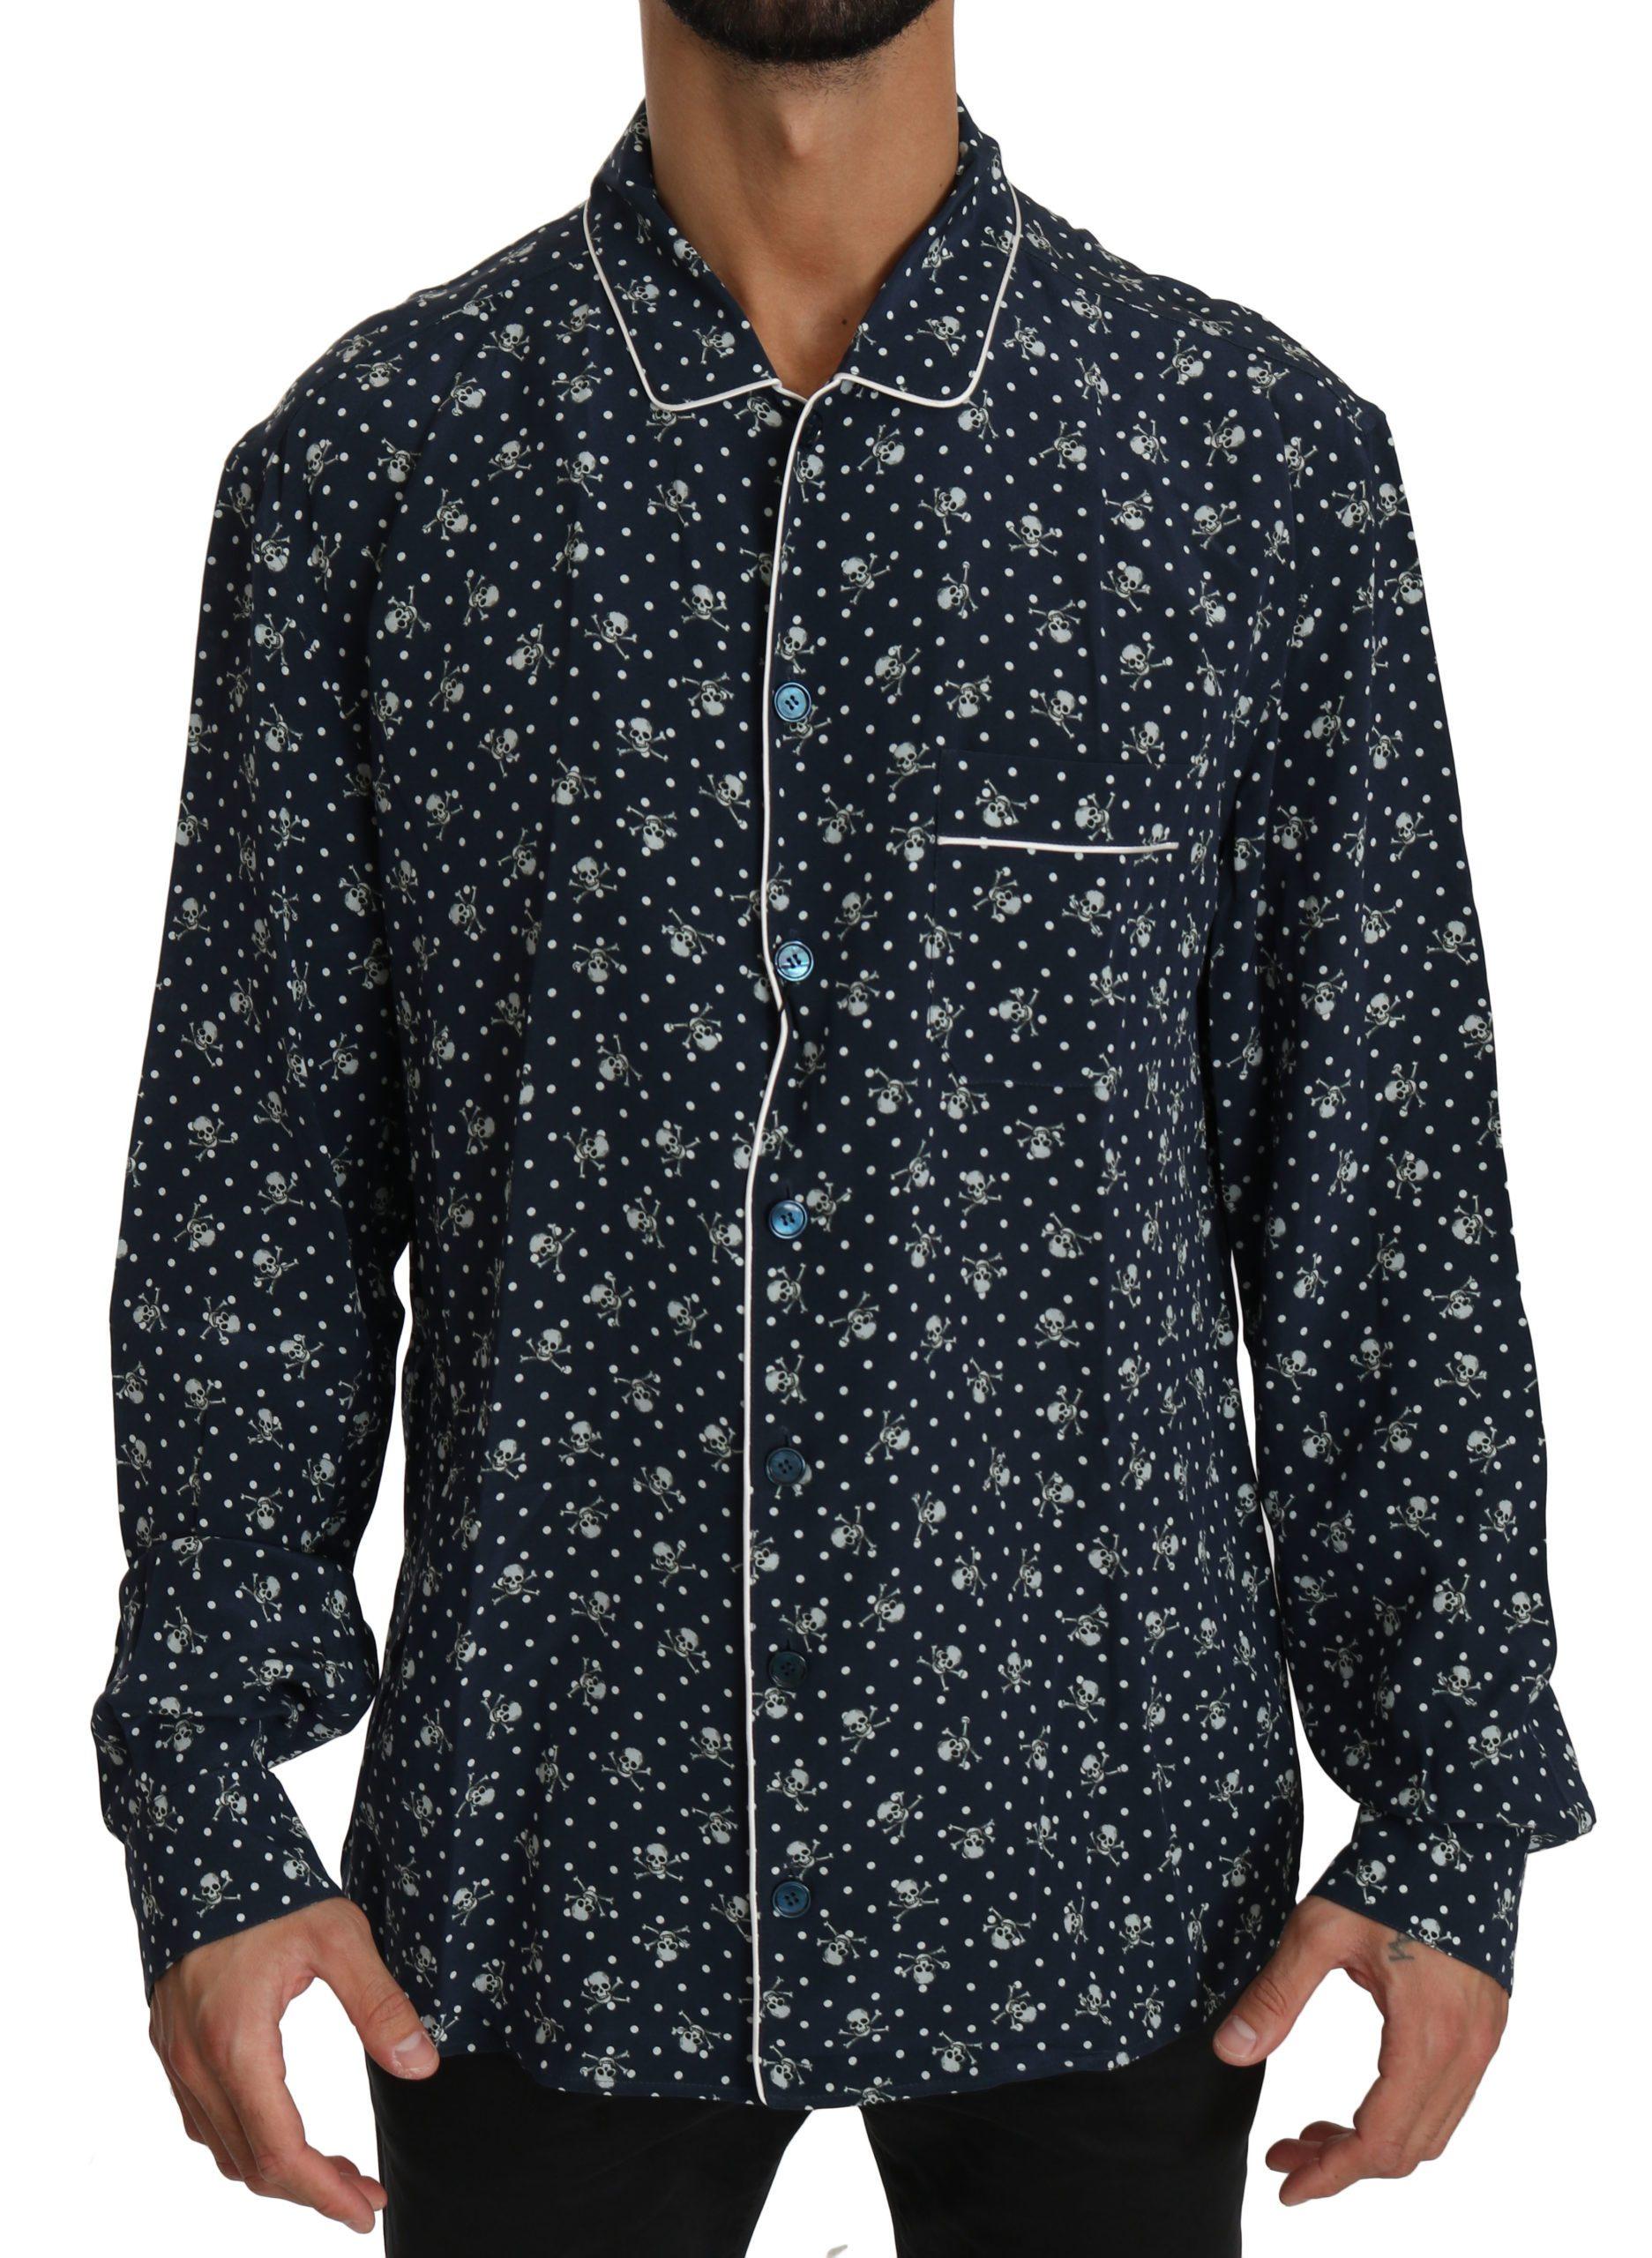 Dolce & Gabbana Men's Skull Print Silk Sleepwear Shirt Blue TSH4014 - IT41 | L